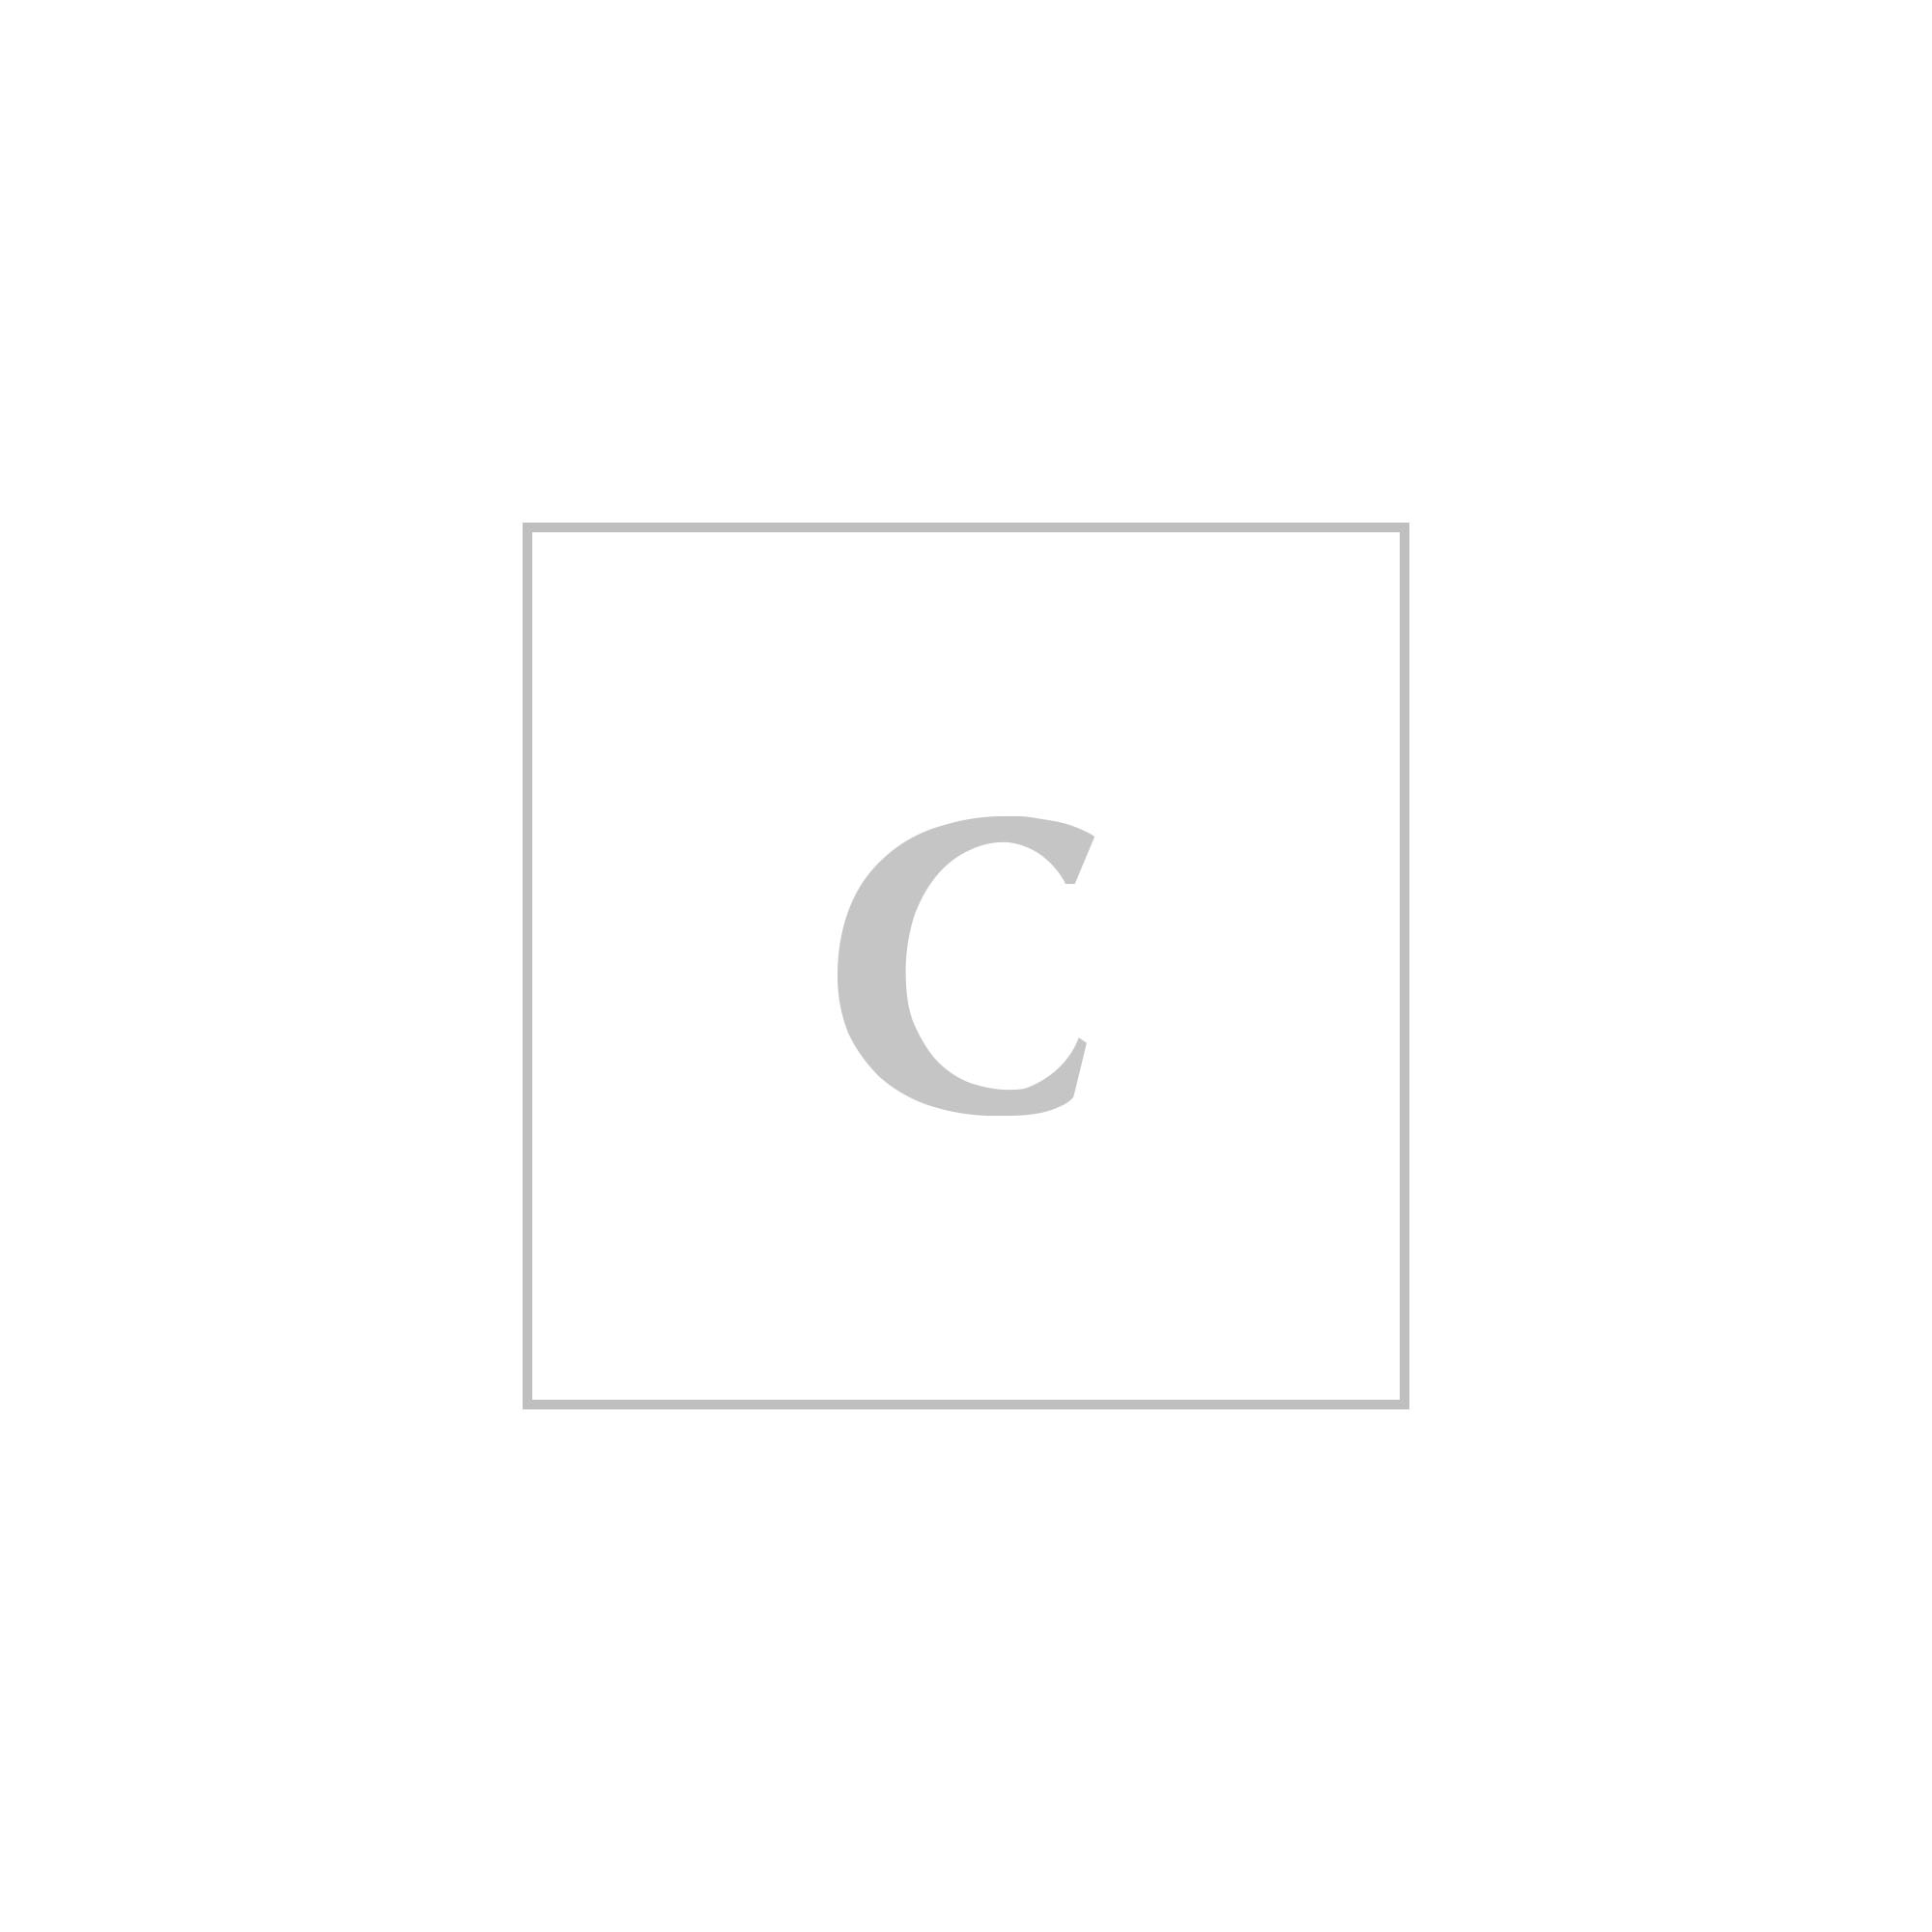 Dolce & gabbana borsa monica in pelle stampa iguana